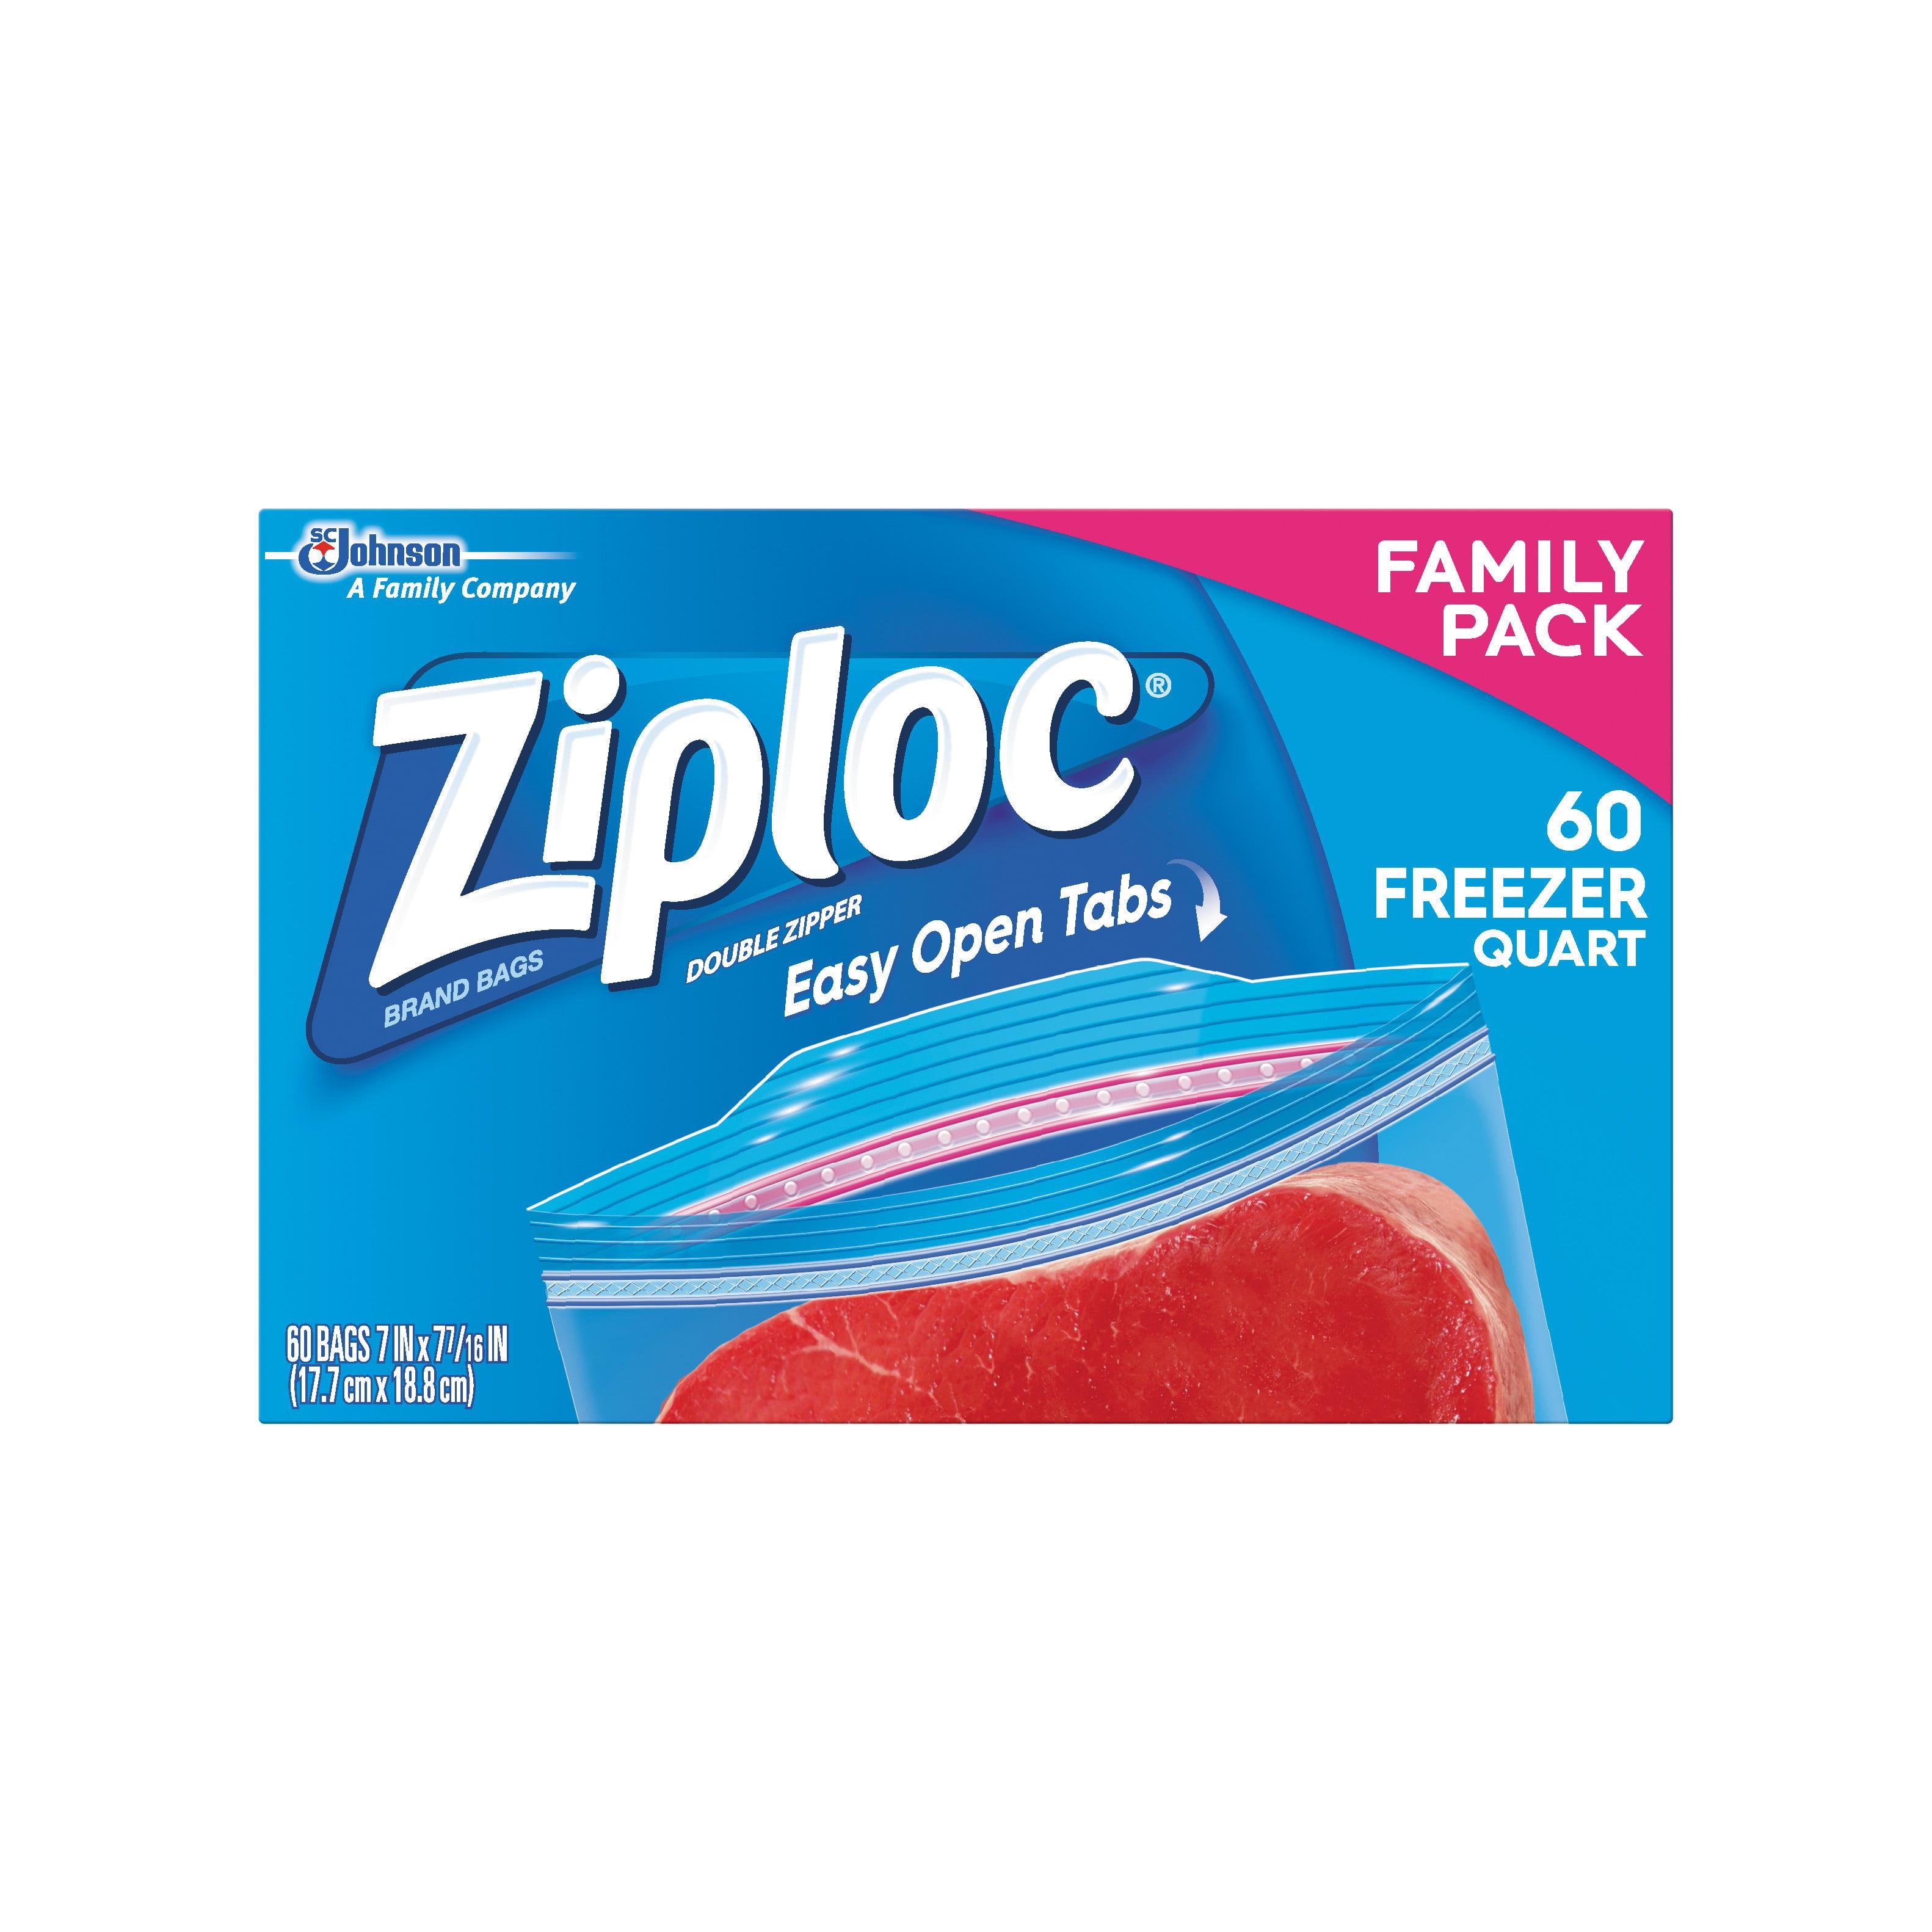 Ziploc Pinch & Seal Freezer Bags, Quart, 60 Count